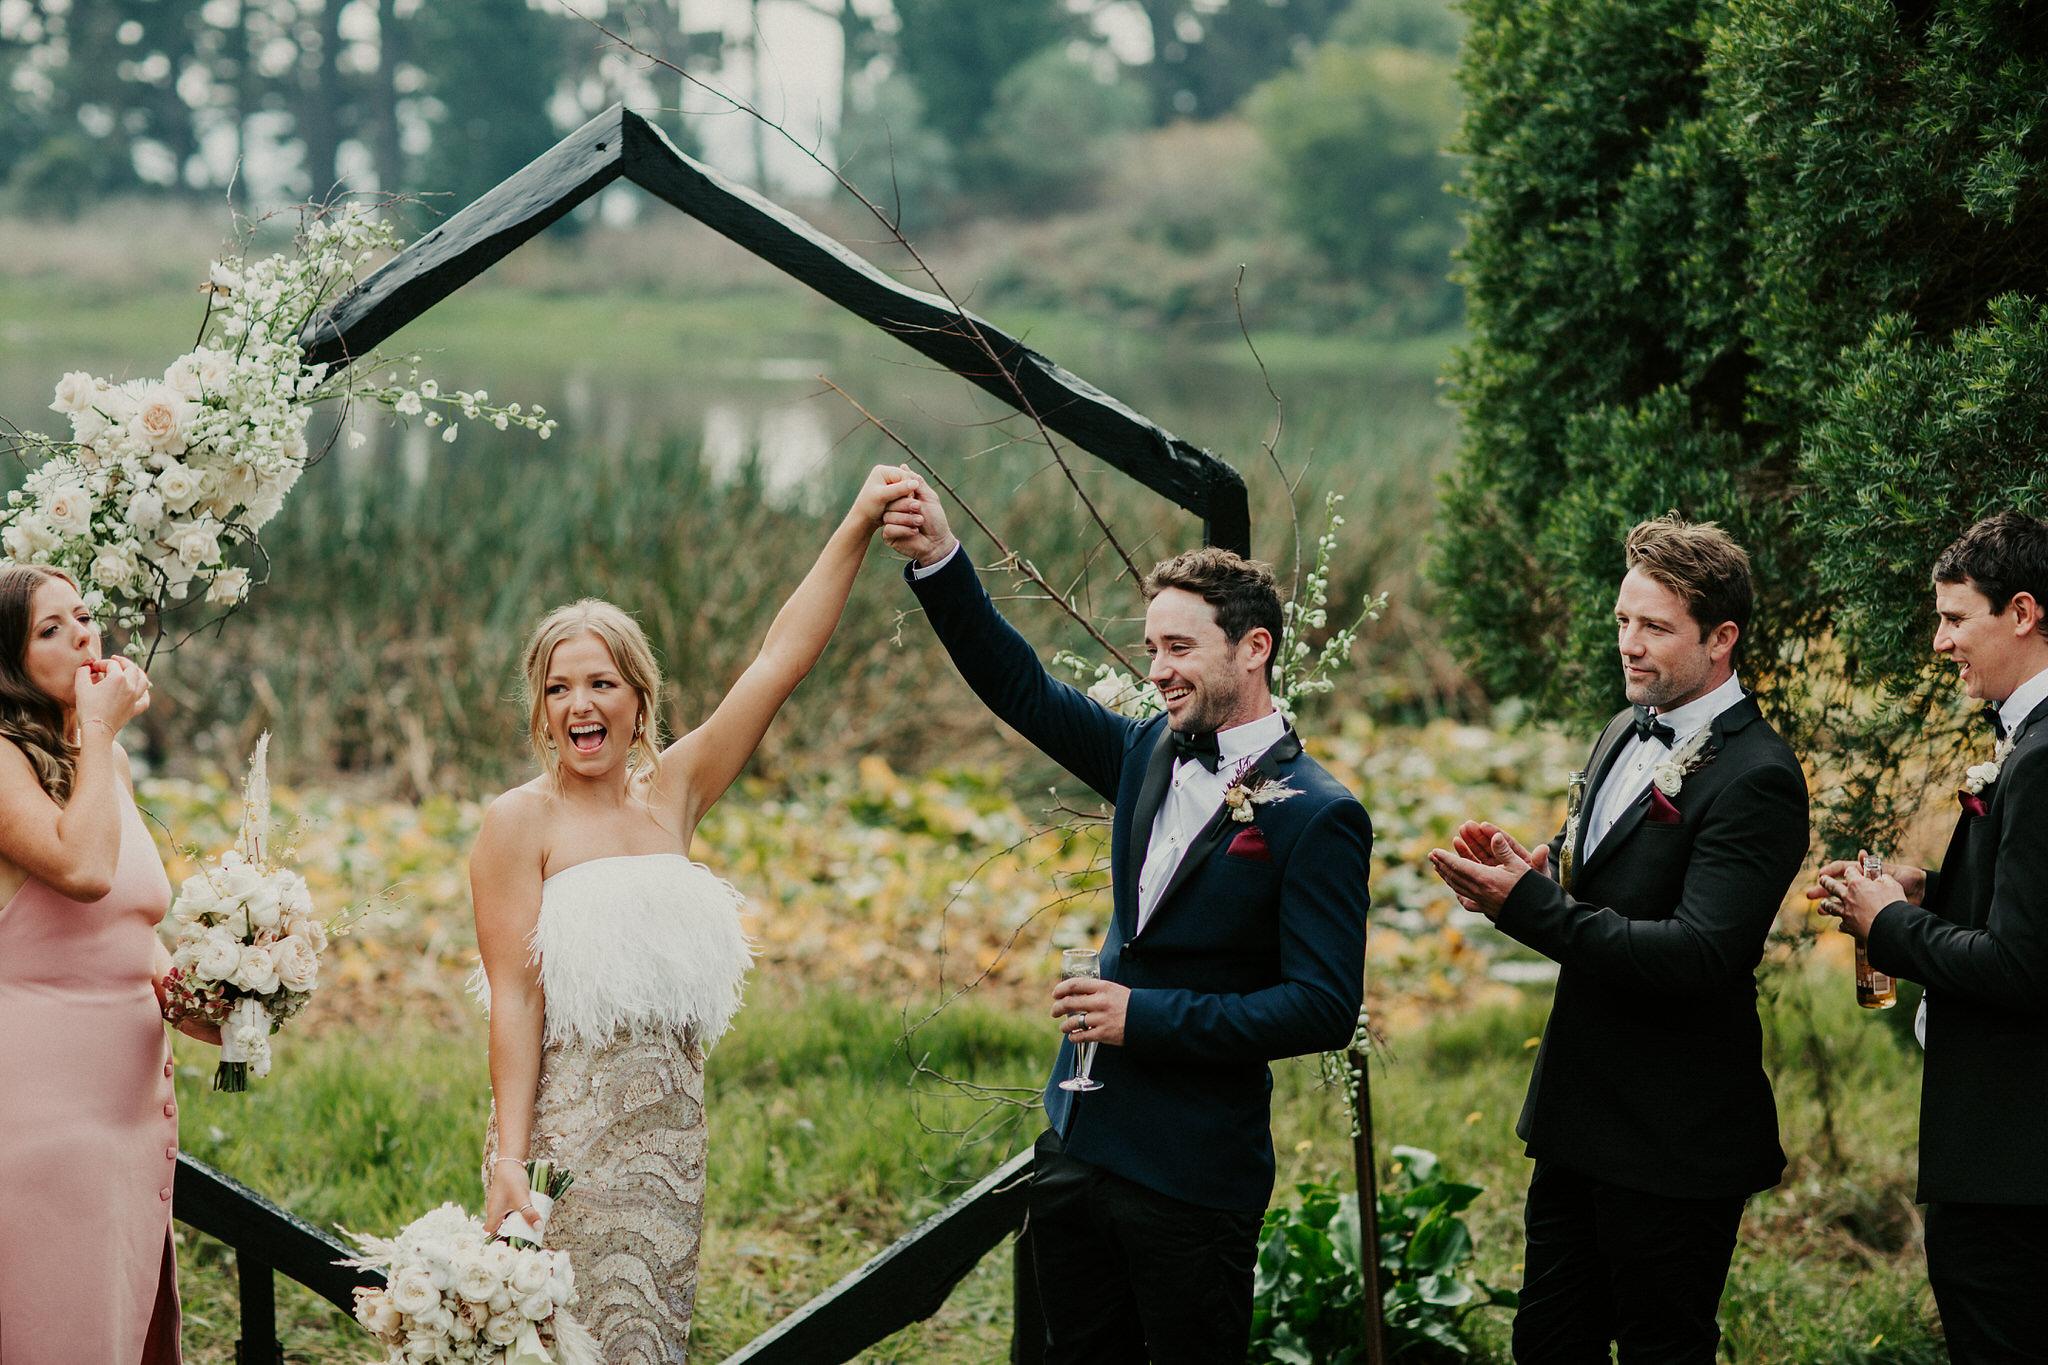 Categories: Weddings-Real Wedding: Bonnie & Jesse - Photography by Daniel Brannan